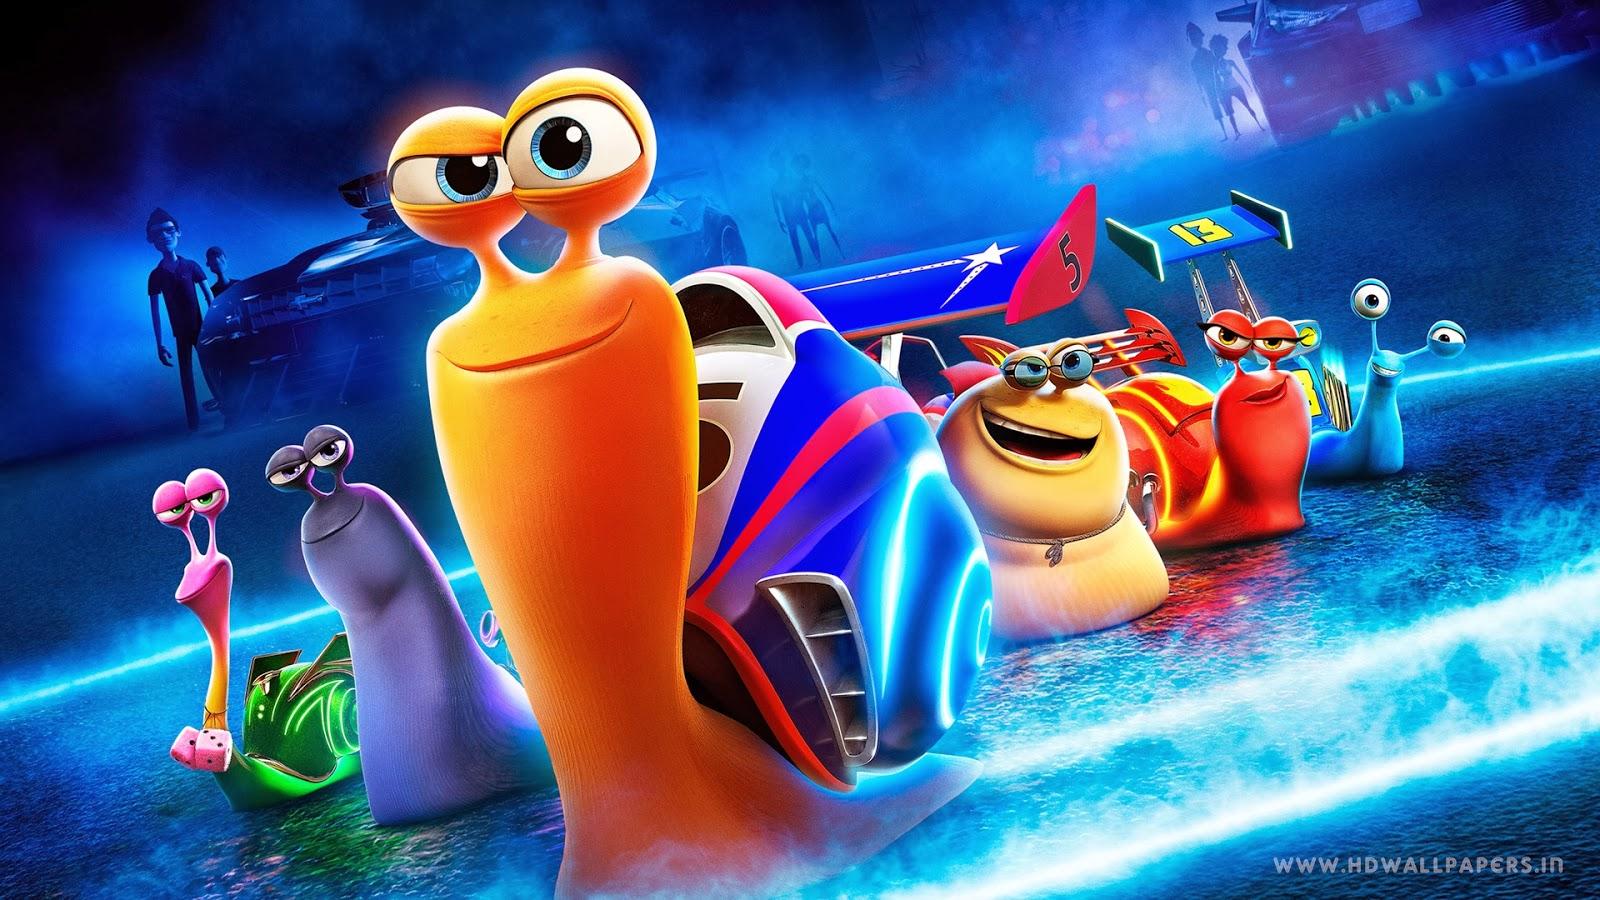 Cool Wallpaper Movie Animated - 2013-Turbo-movie-HD-Wallpaper-cartoon-1080p-1920x1080  HD_4202.jpg